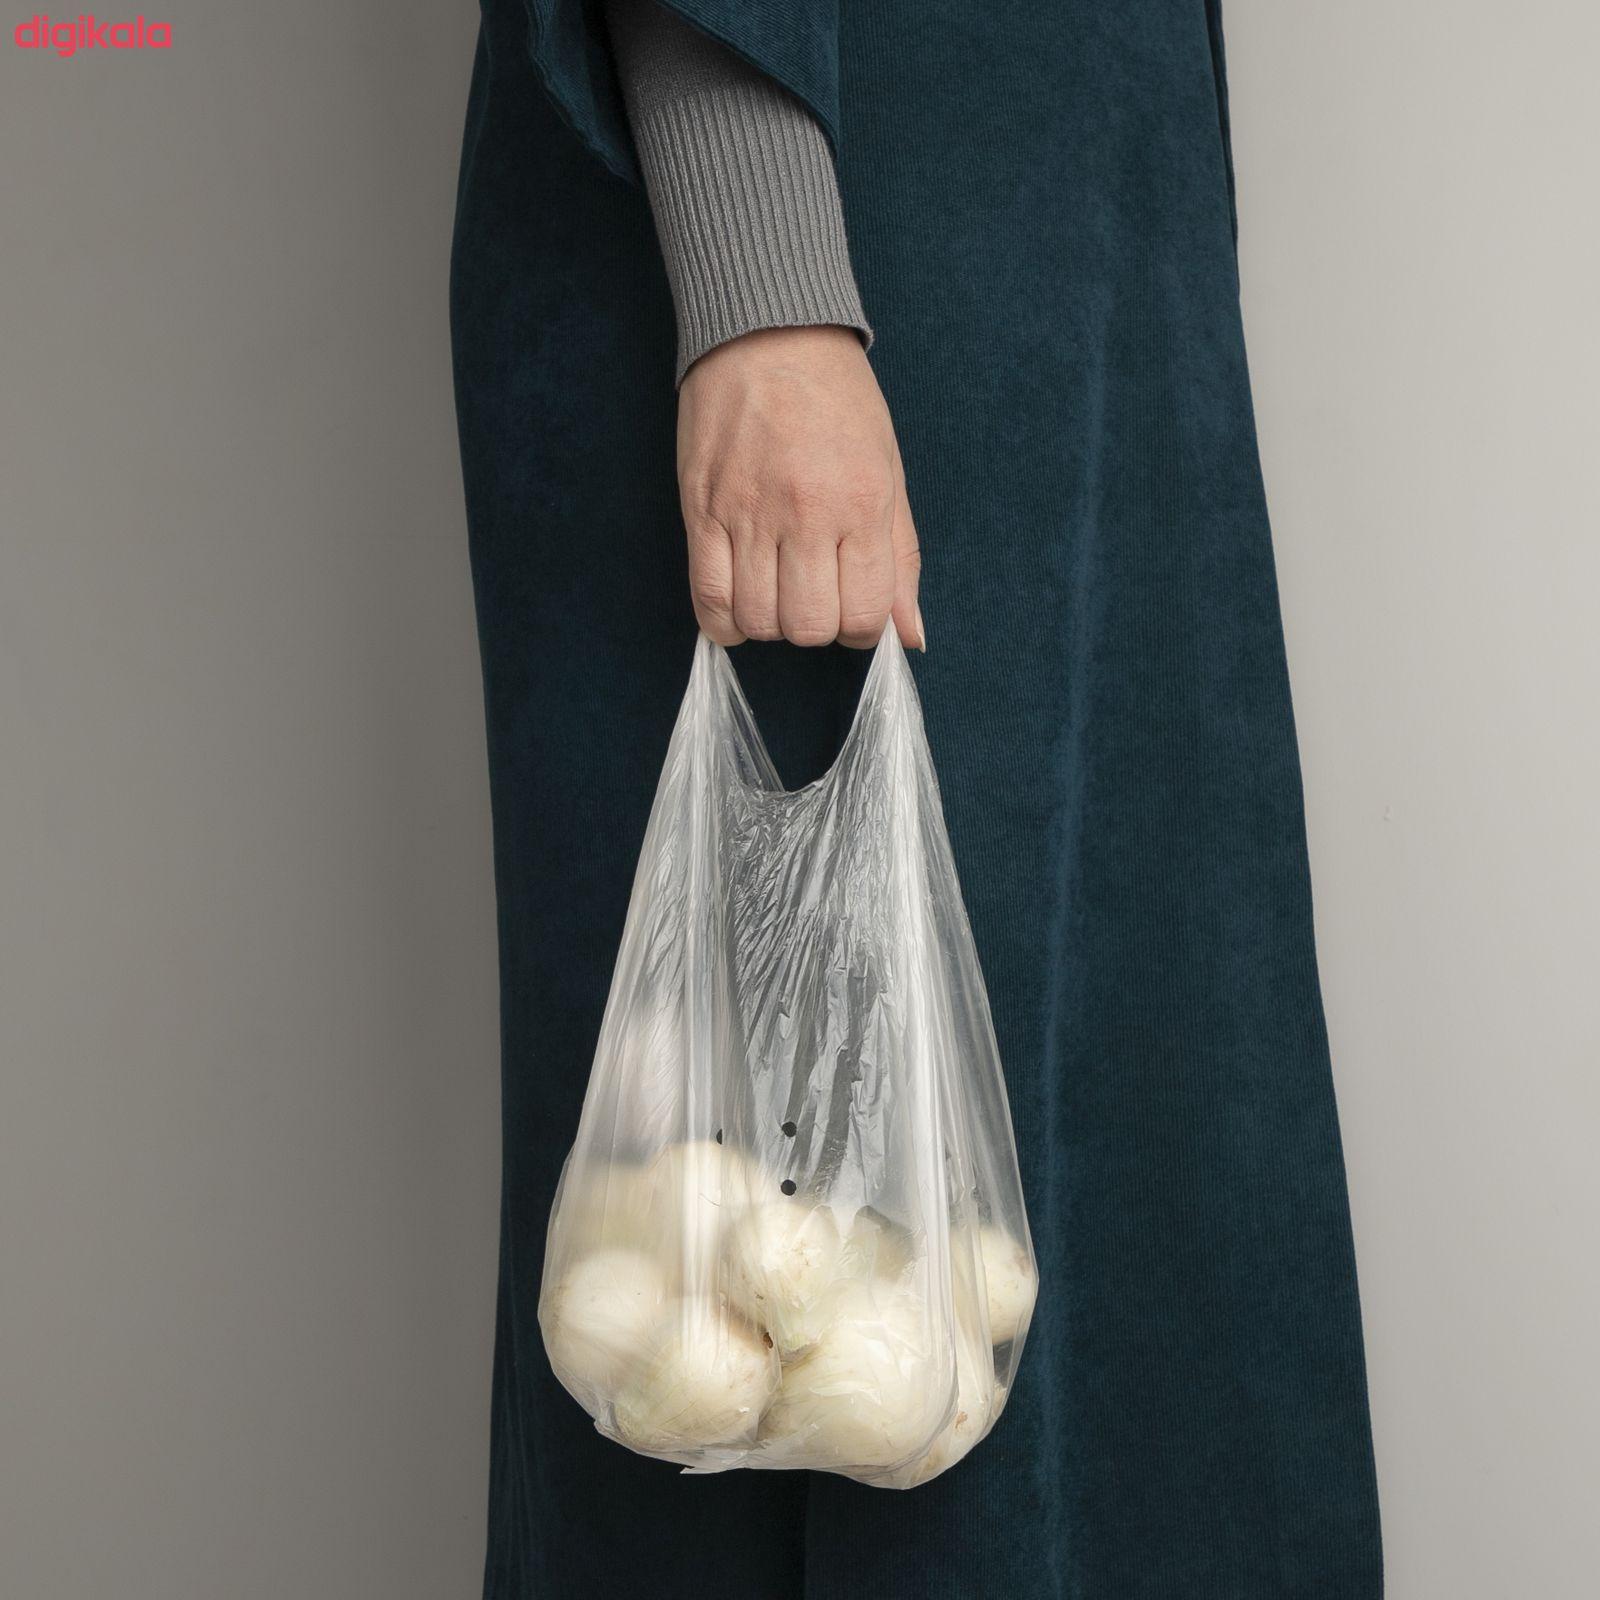 پیاز سفید فله - 1 کیلوگرم main 1 2